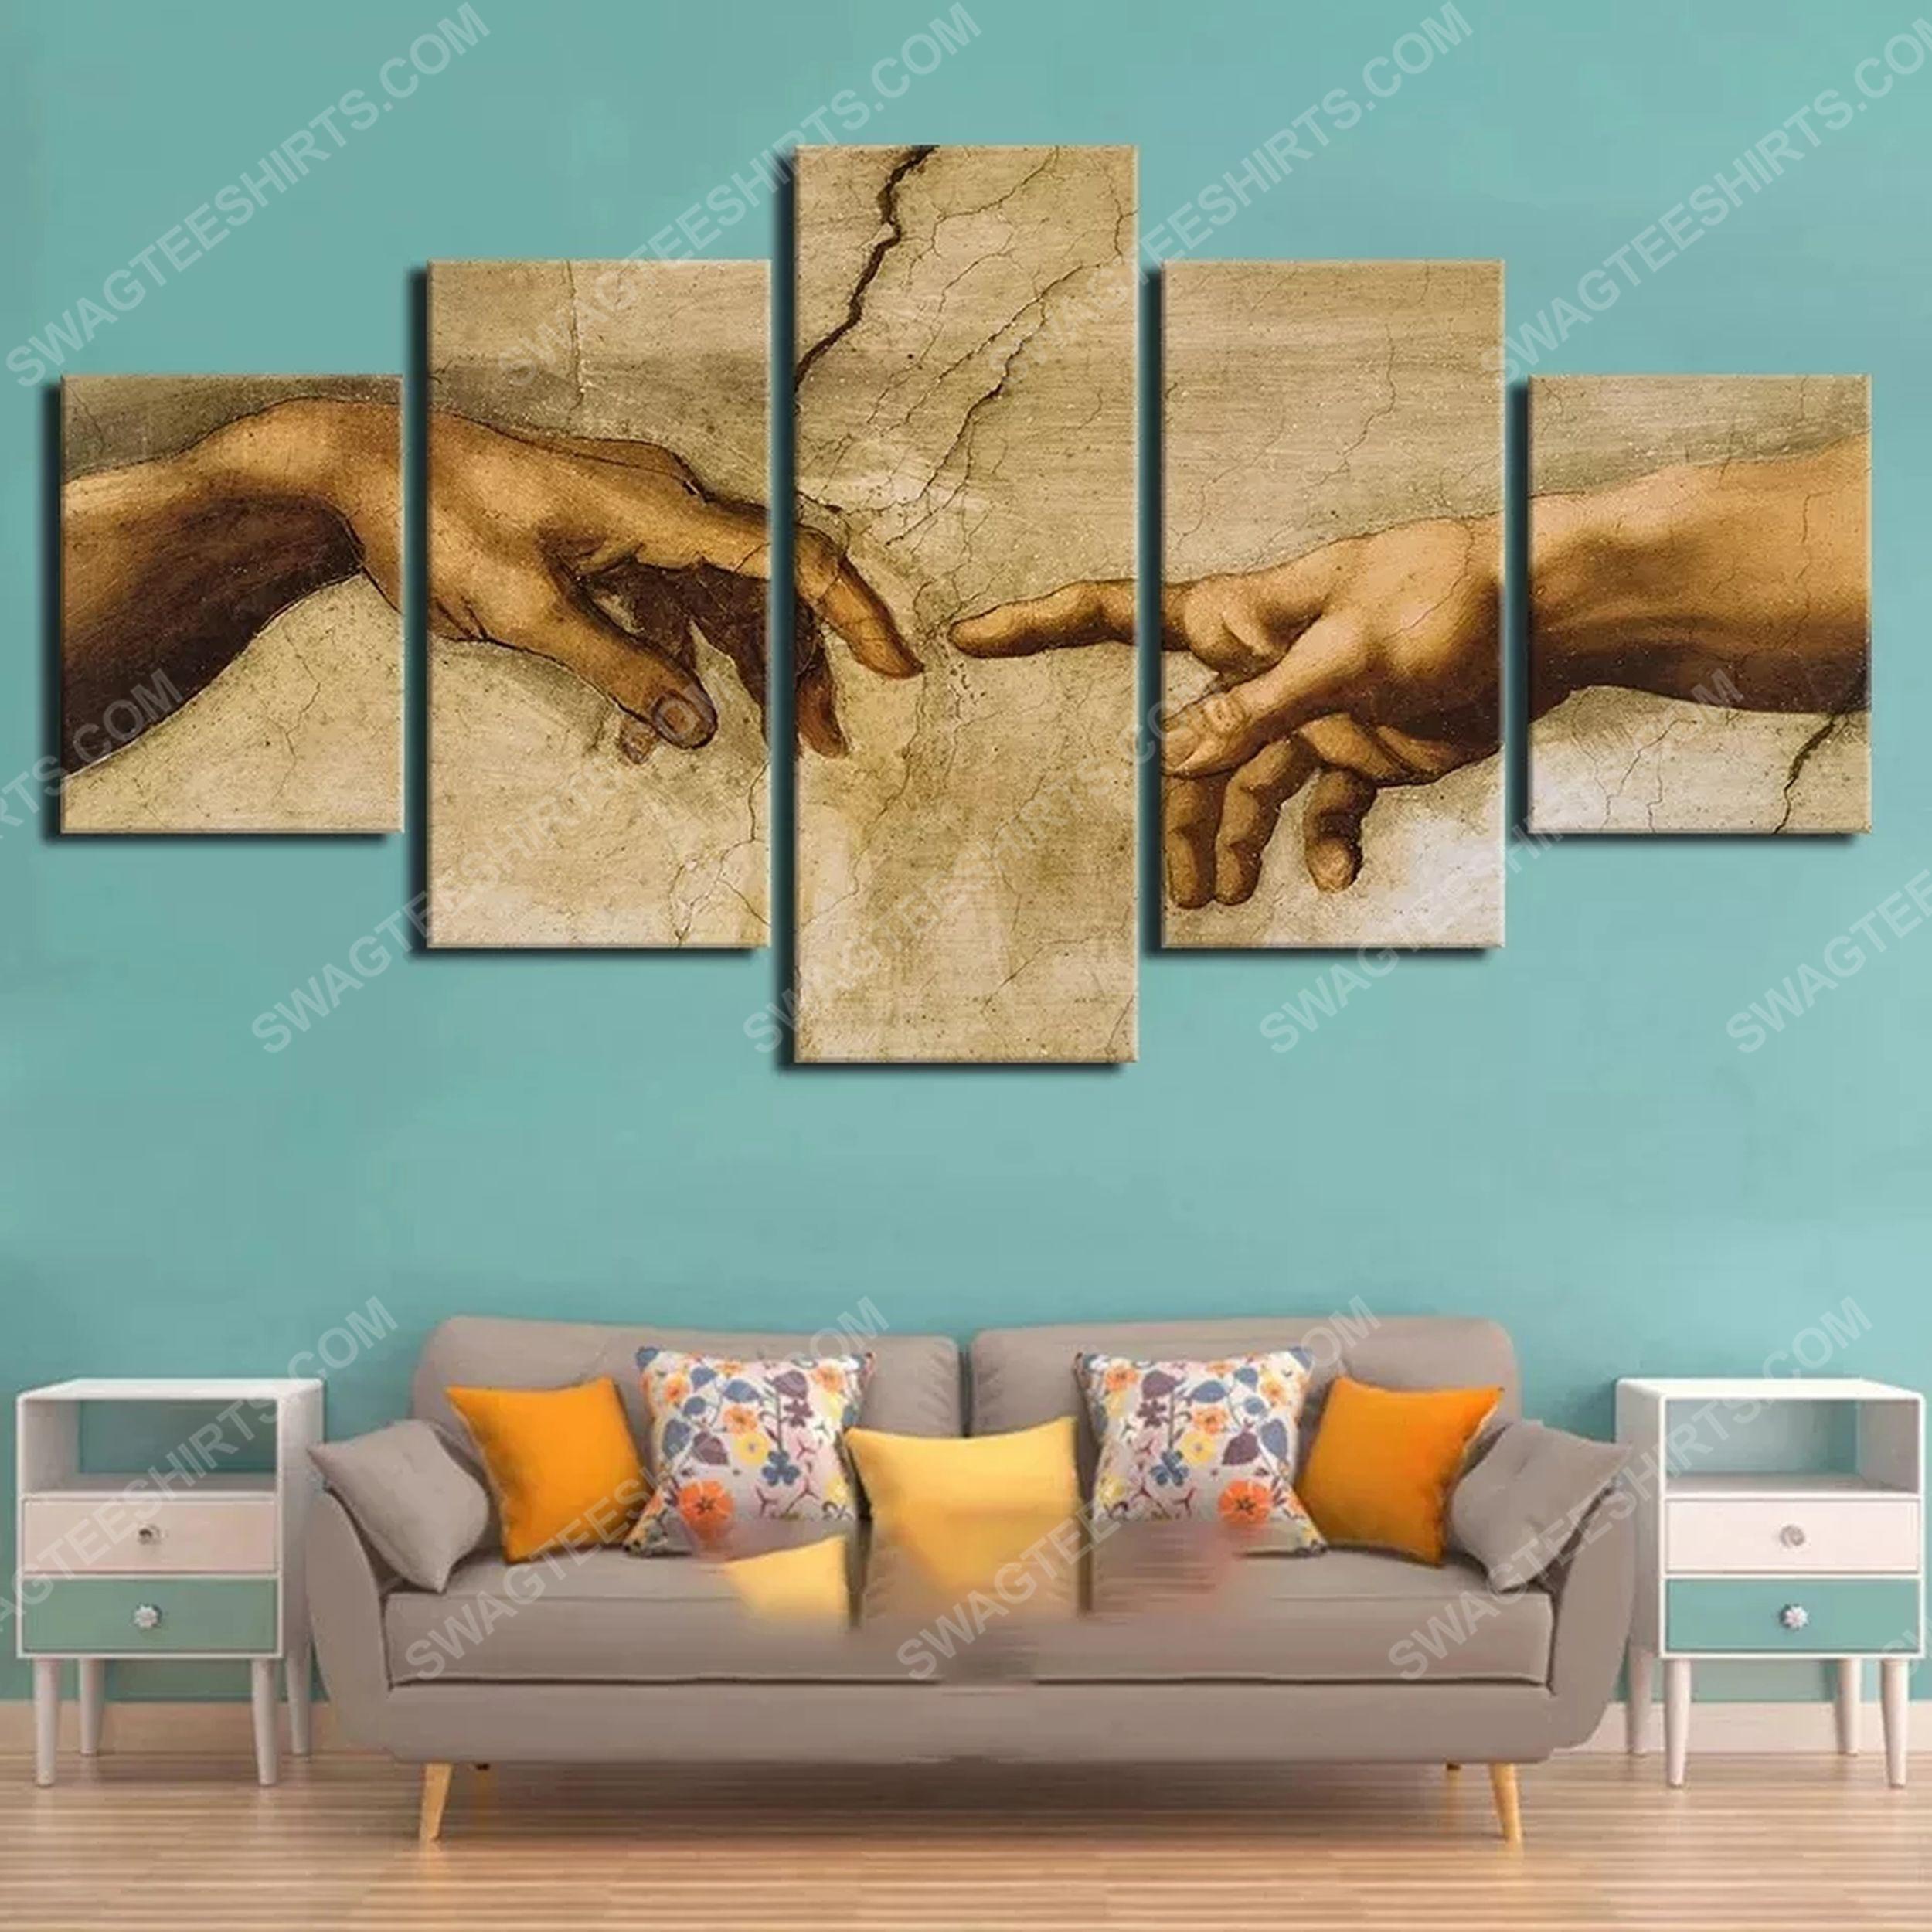 Adam hand of god print painting canvas wall art home decor